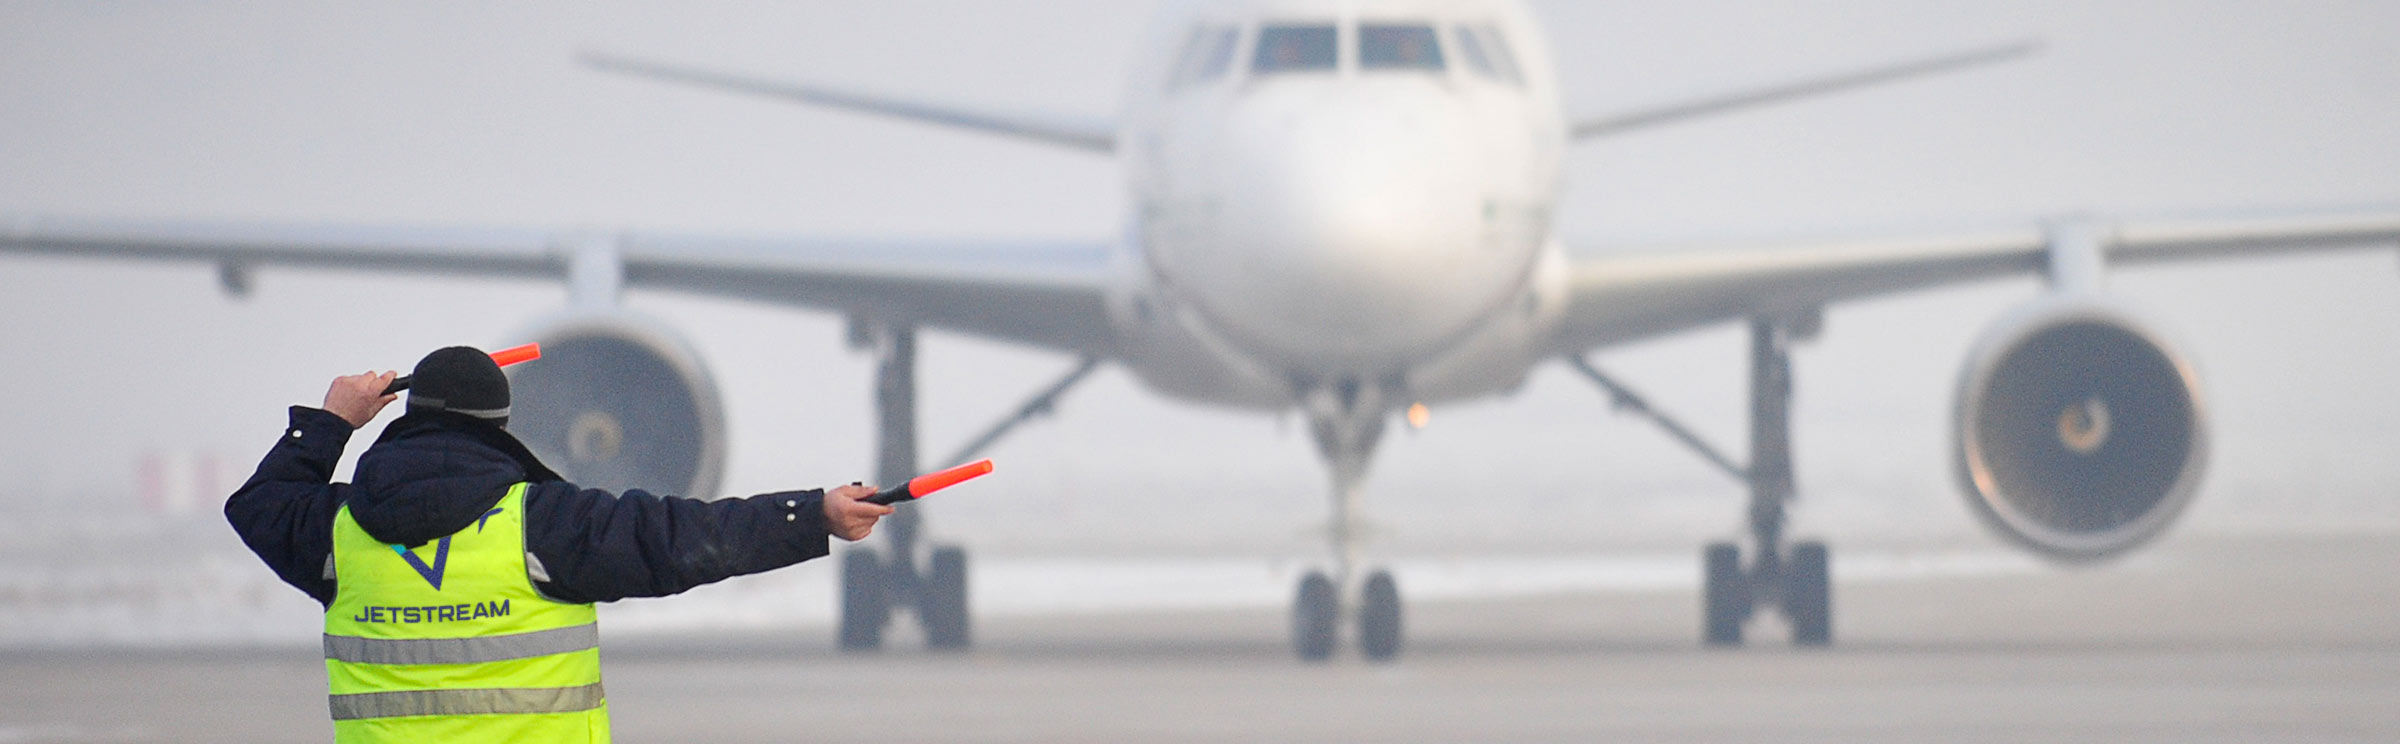 Jetstream Ground Services airplane marshaling